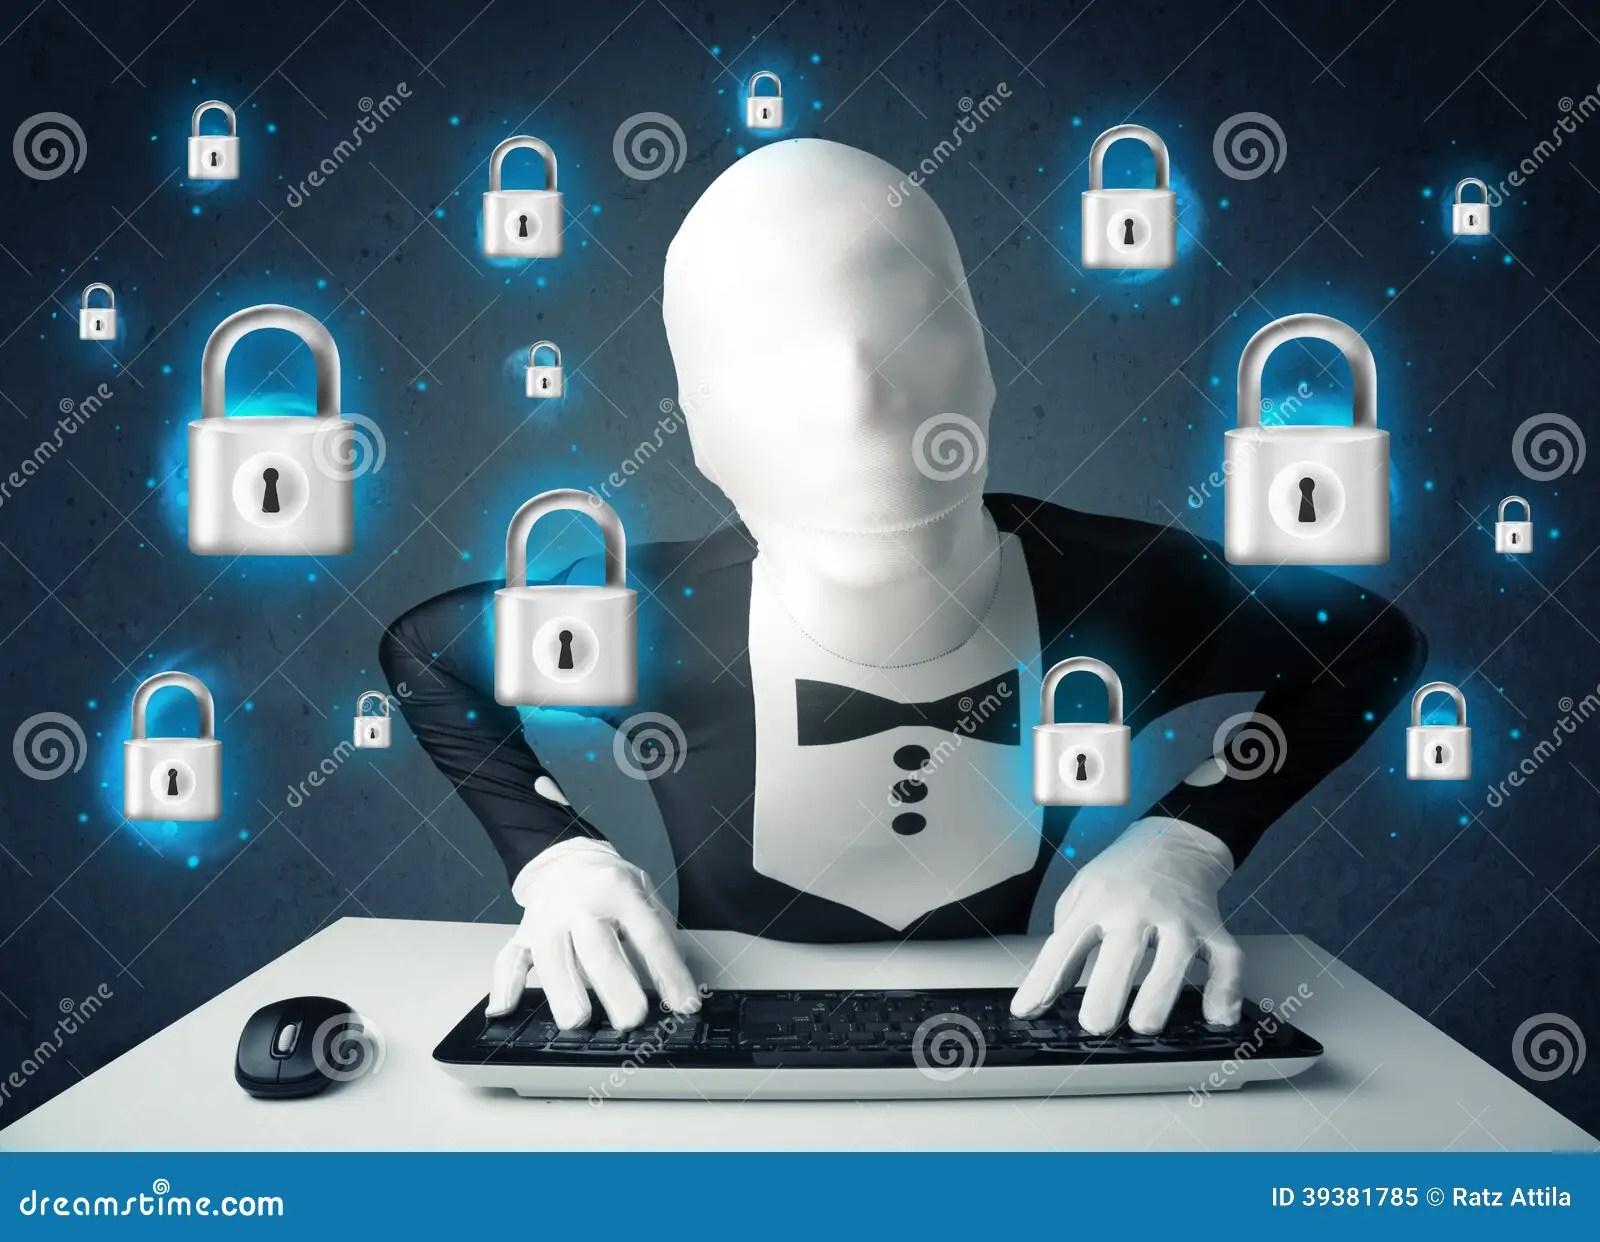 https://i0.wp.com/thumbs.dreamstime.com/z/pirate-informatique-dans-le-d%C3%A9guisement-avec-des-symboles-et-des-ic-nes-virtuels-de-serrure-39381785.jpg